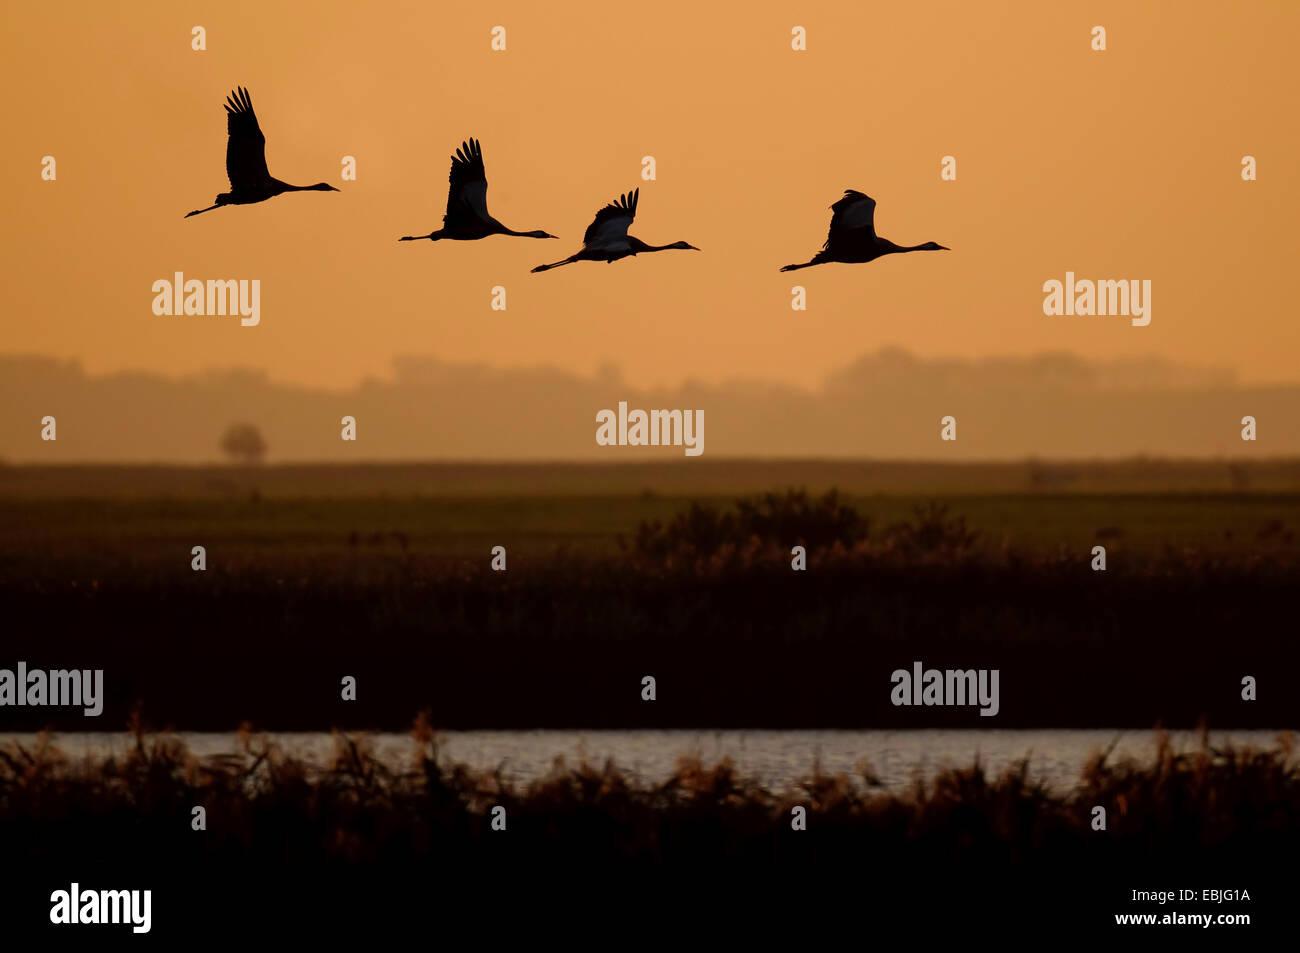 Common crane, Eurasian Crane (Grus grus), cranes flying in the evening, Germany, Mecklenburg-Western Pomerania Stock Photo